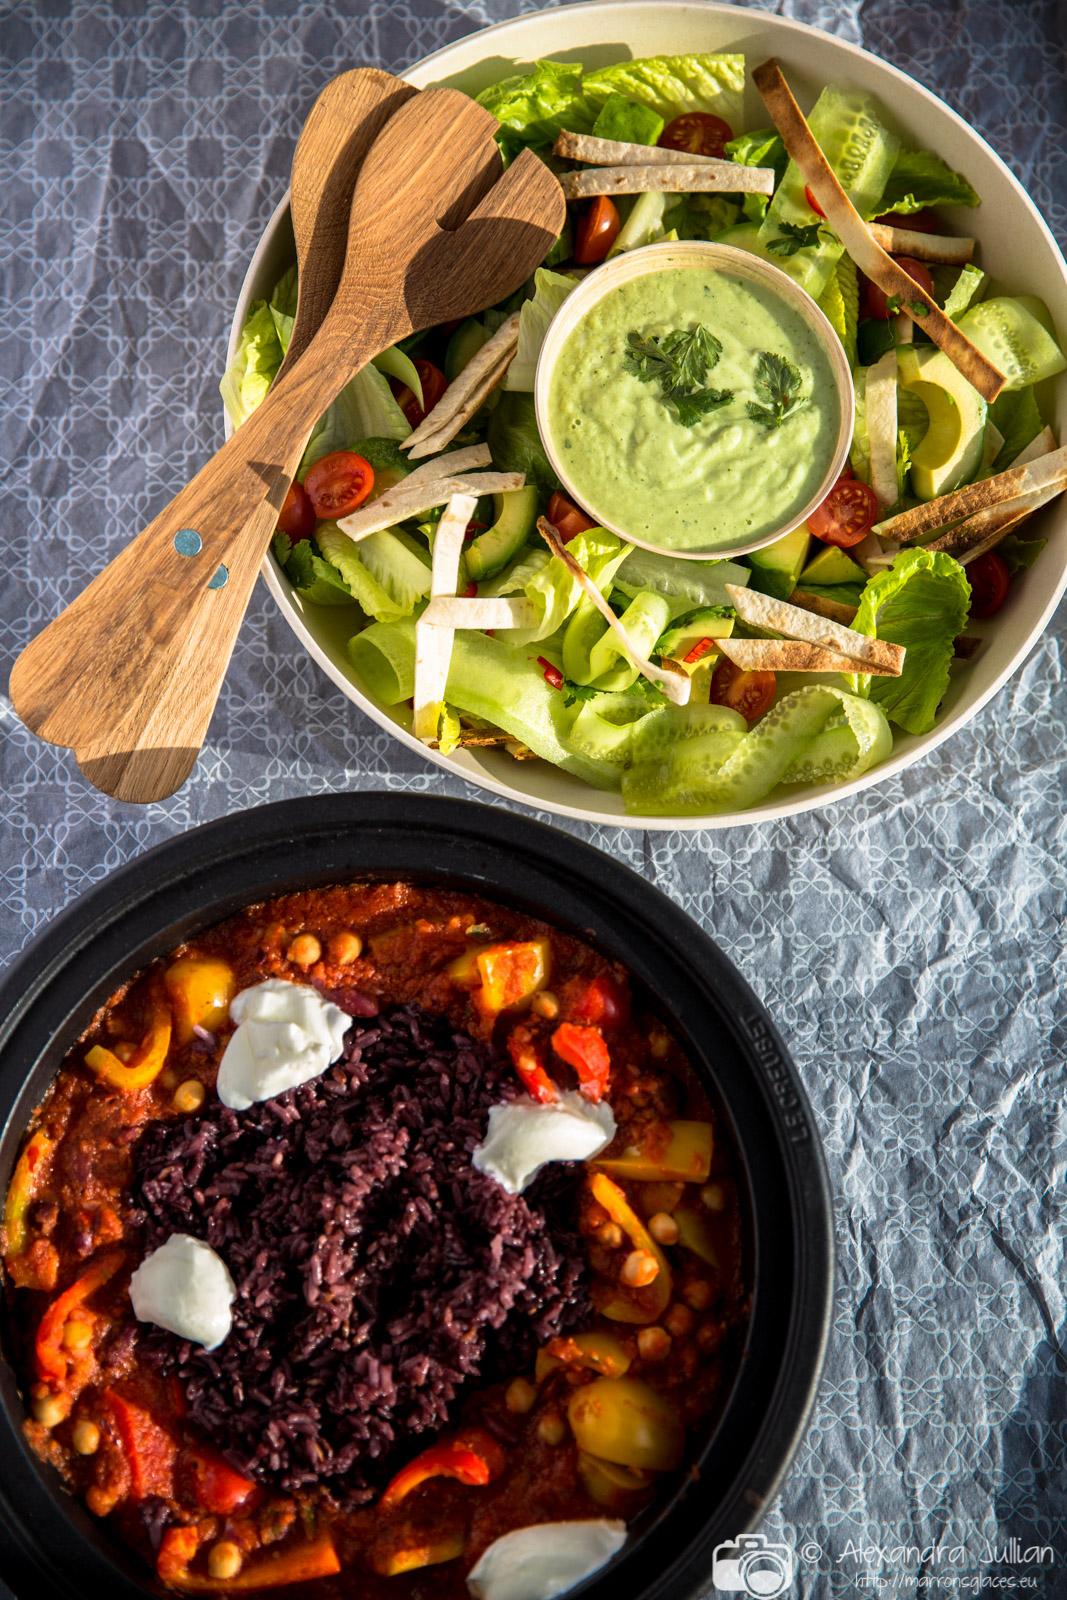 Chilli végétarien, salade de tortillas croquantes et avocat